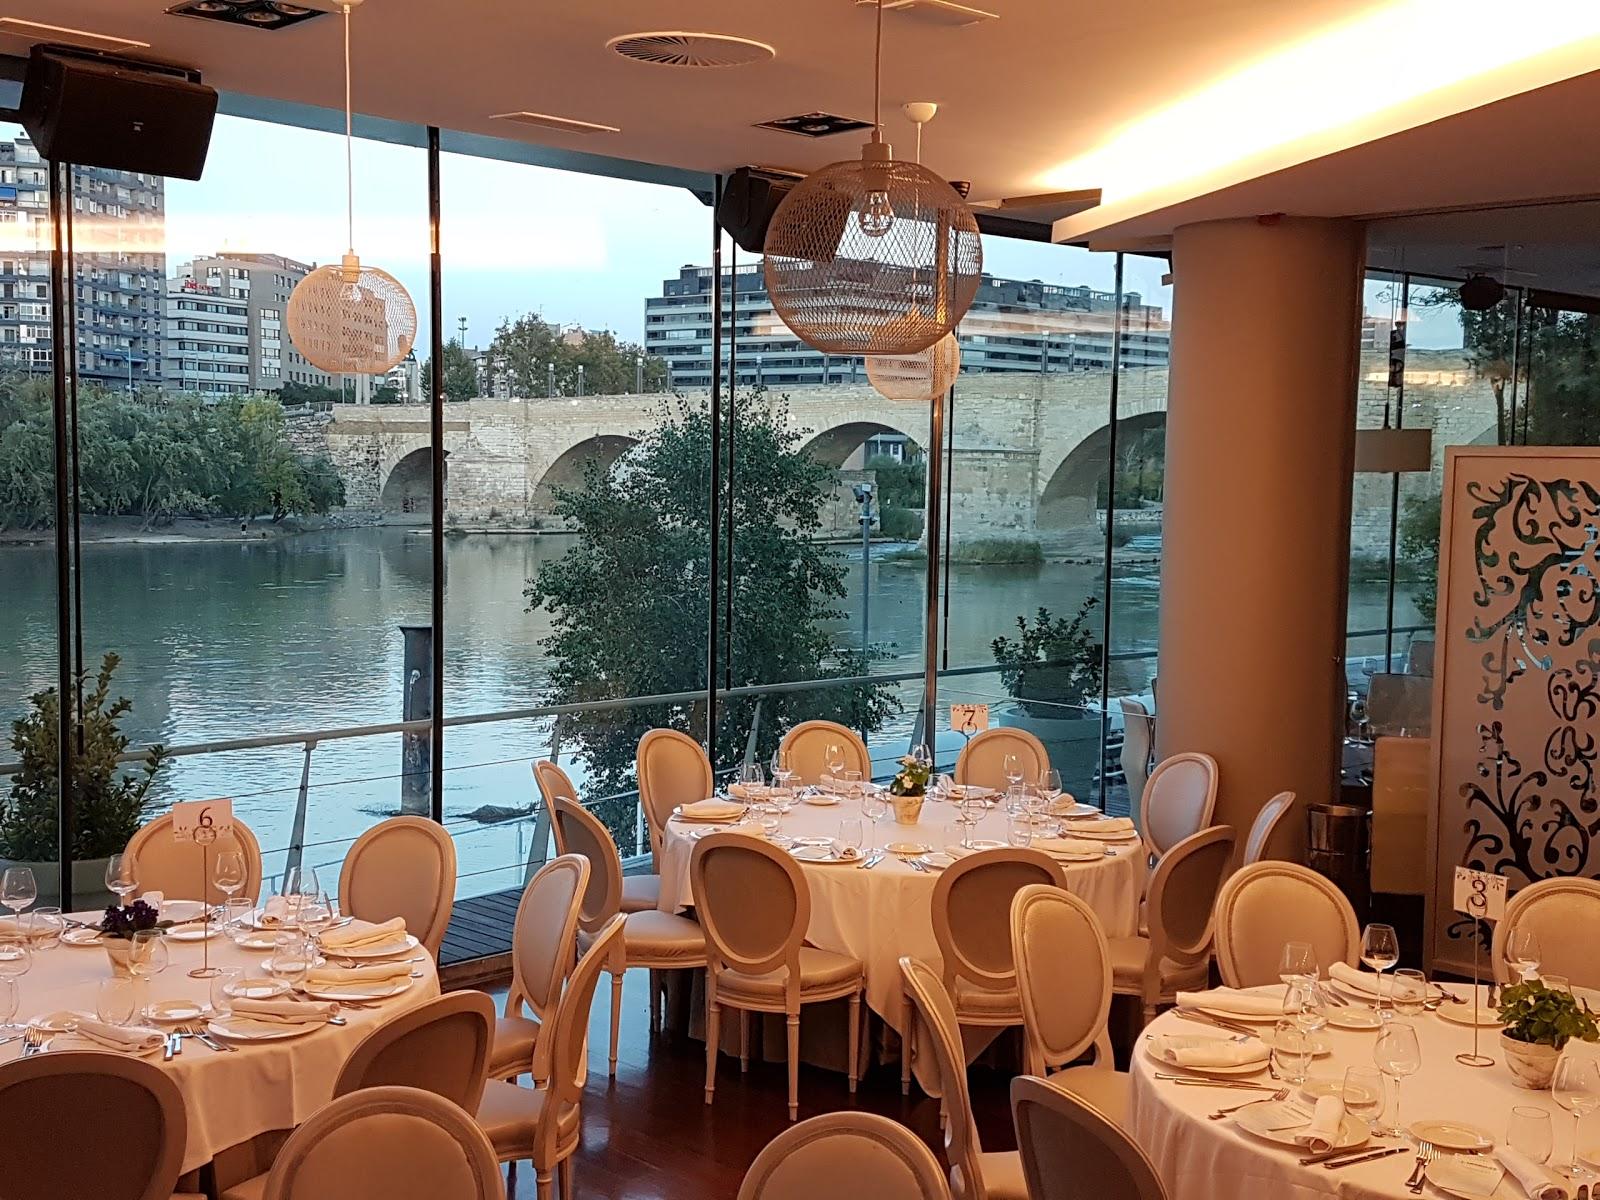 Zaragoza zaragoza qu ver y d nde dormir - Restaurante club nautico zaragoza ...